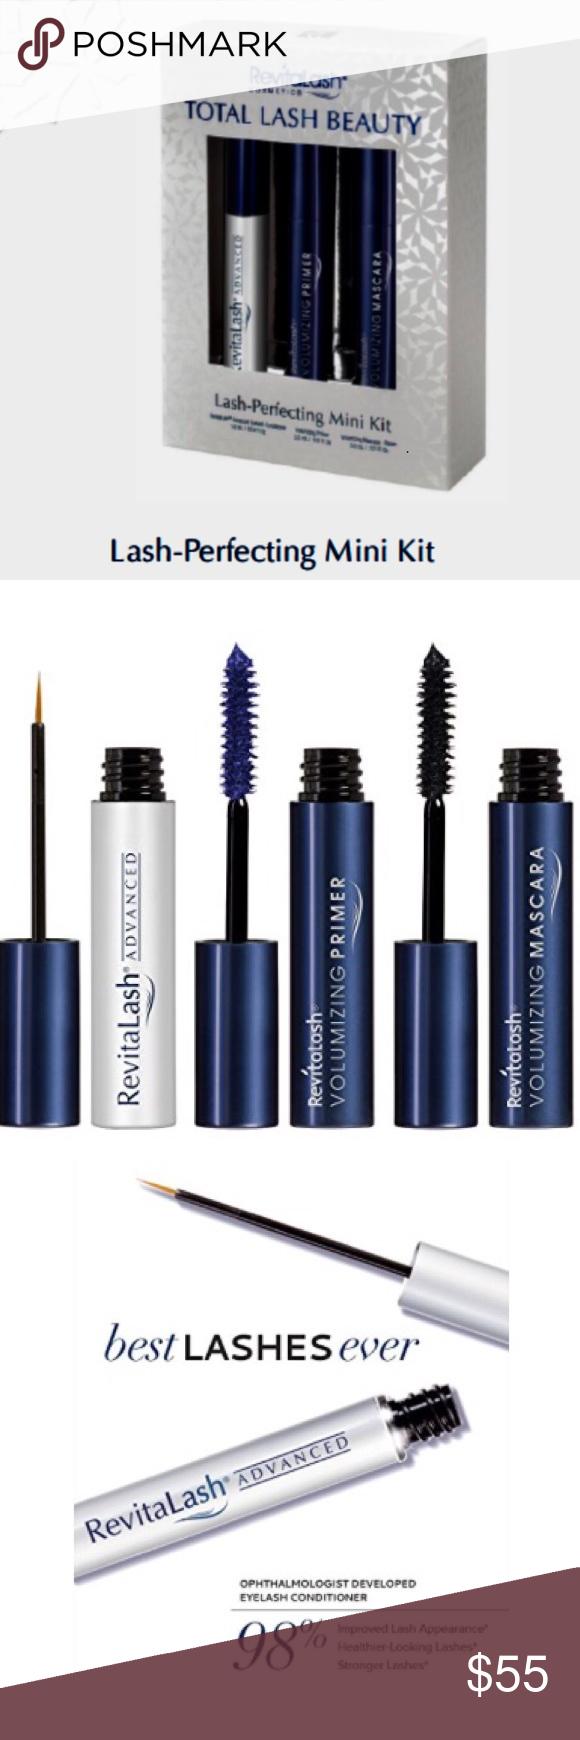 9083574bf50 💕Revitalash Cosmetics total lash beauty mini kit. Total lash beauty, lash -perfecting